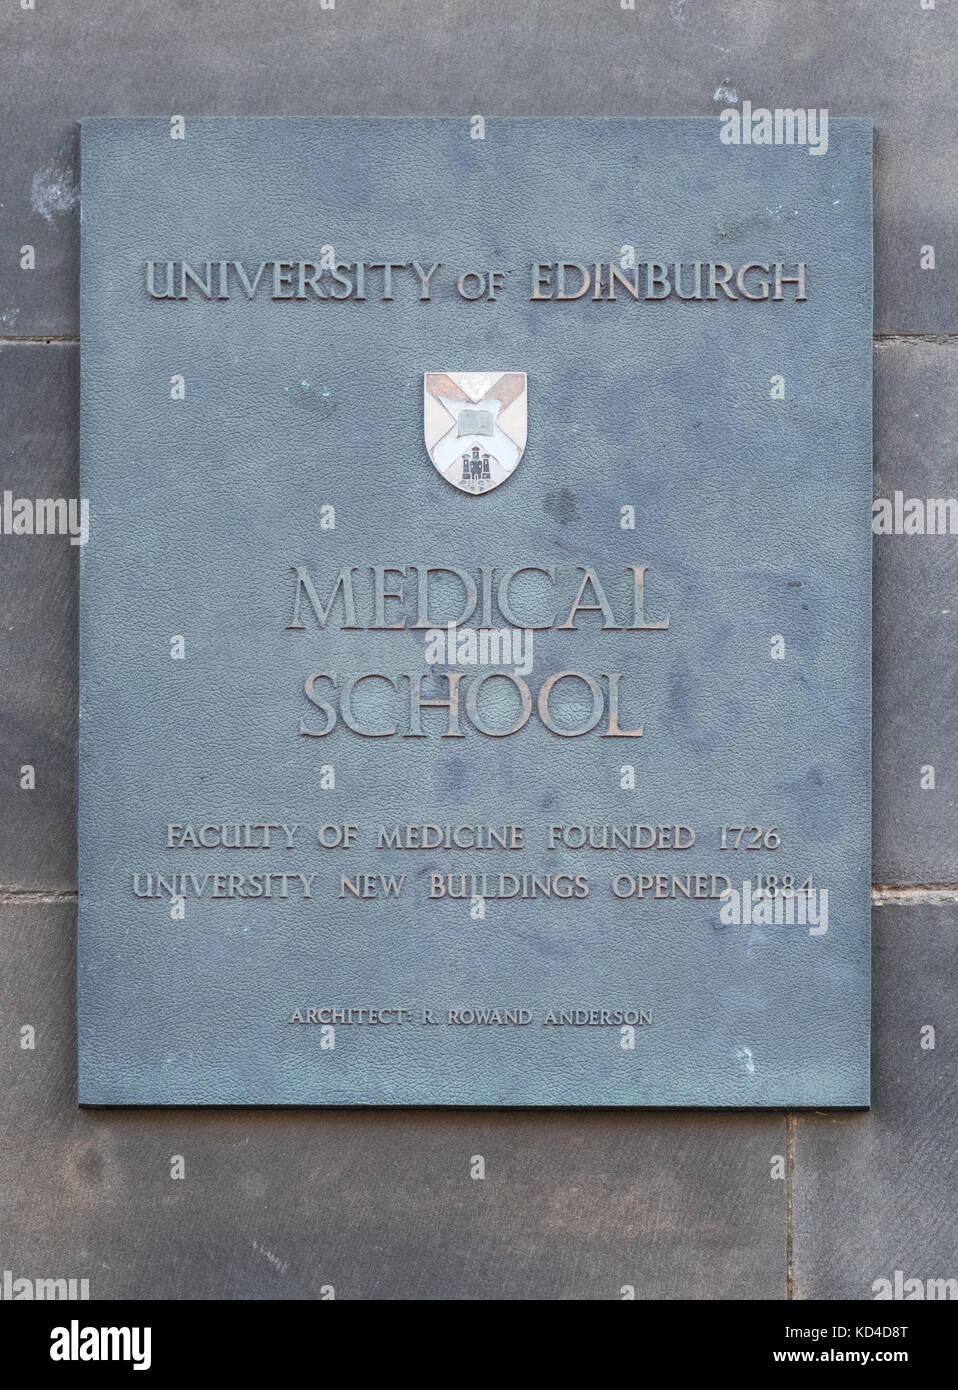 Edinburgh Medical School sign, Edinburgh, Scotland, UK - Stock Image